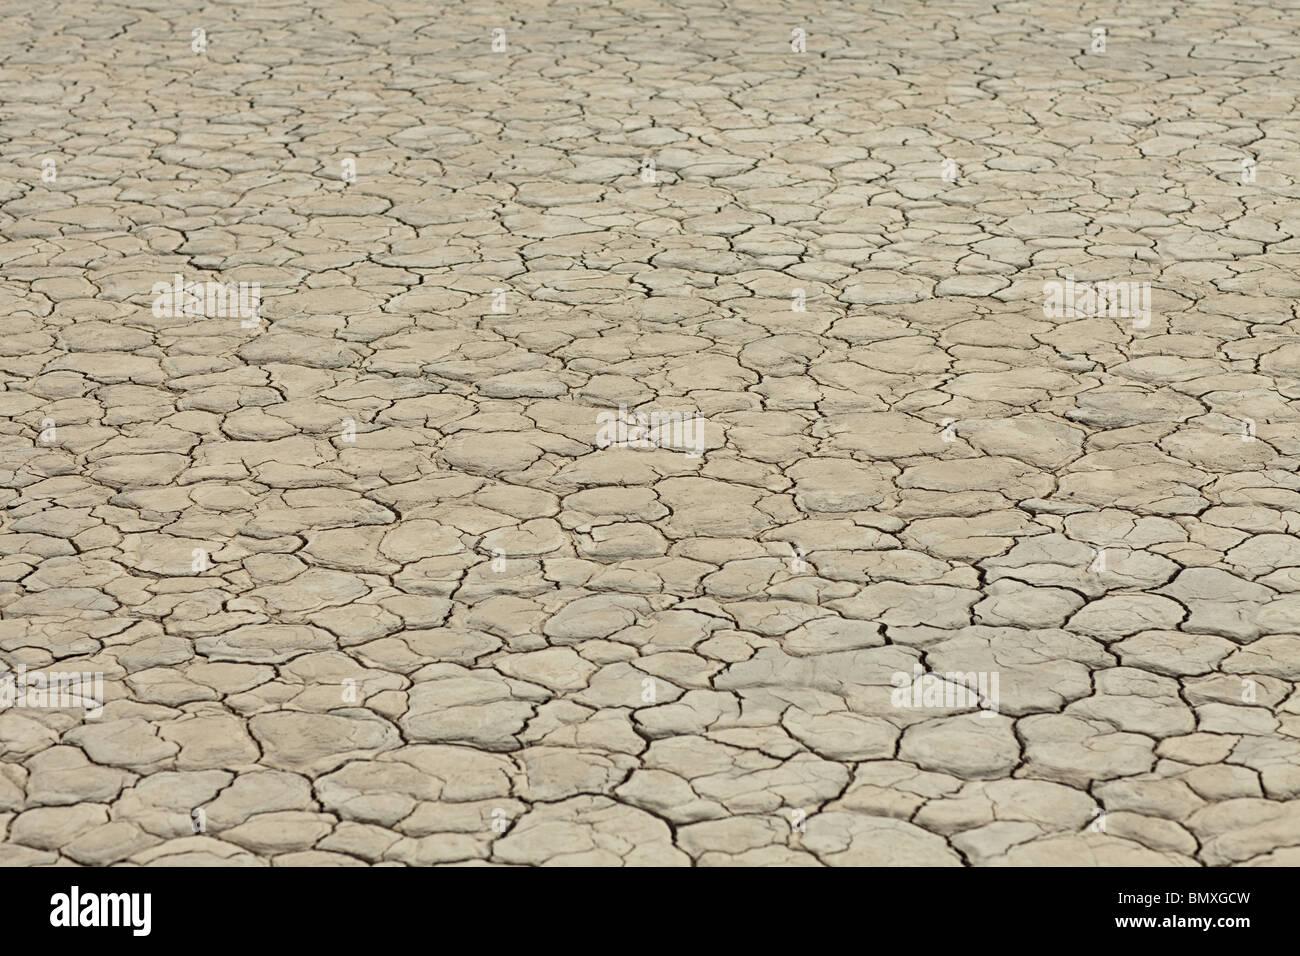 Surface fissurée de dry lake bed Photo Stock